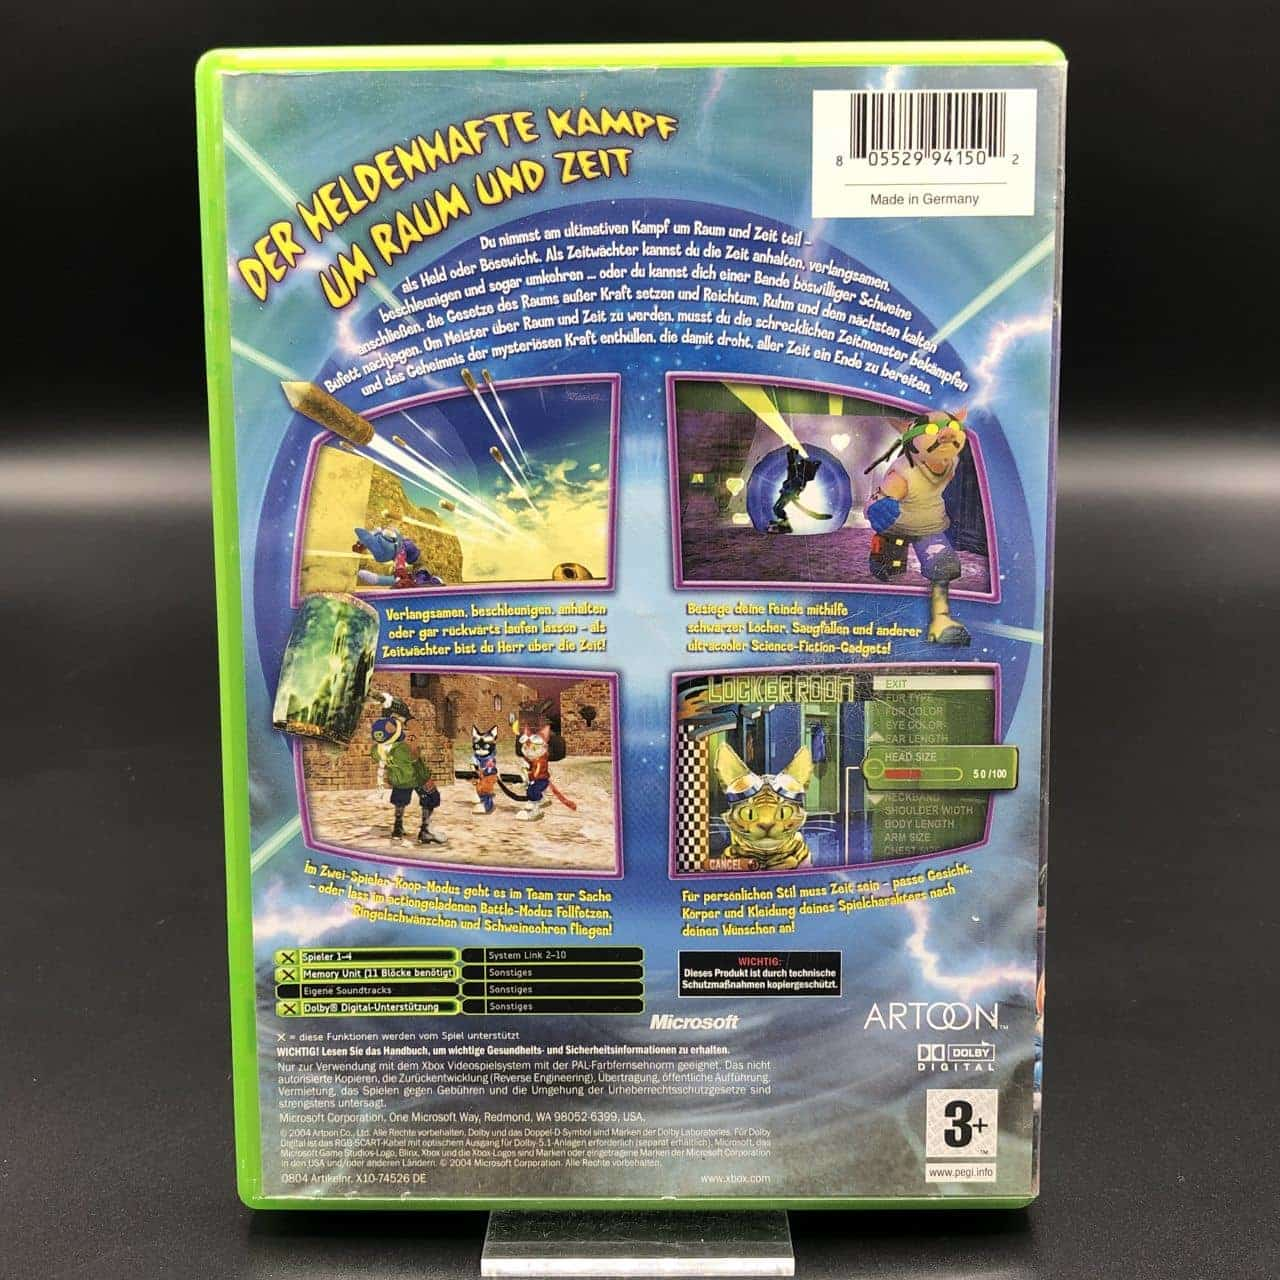 XBC Blinx 2: Masters of Time and Space (Komplett) (Gebrauchsspuren) Microsoft Xbox Classic